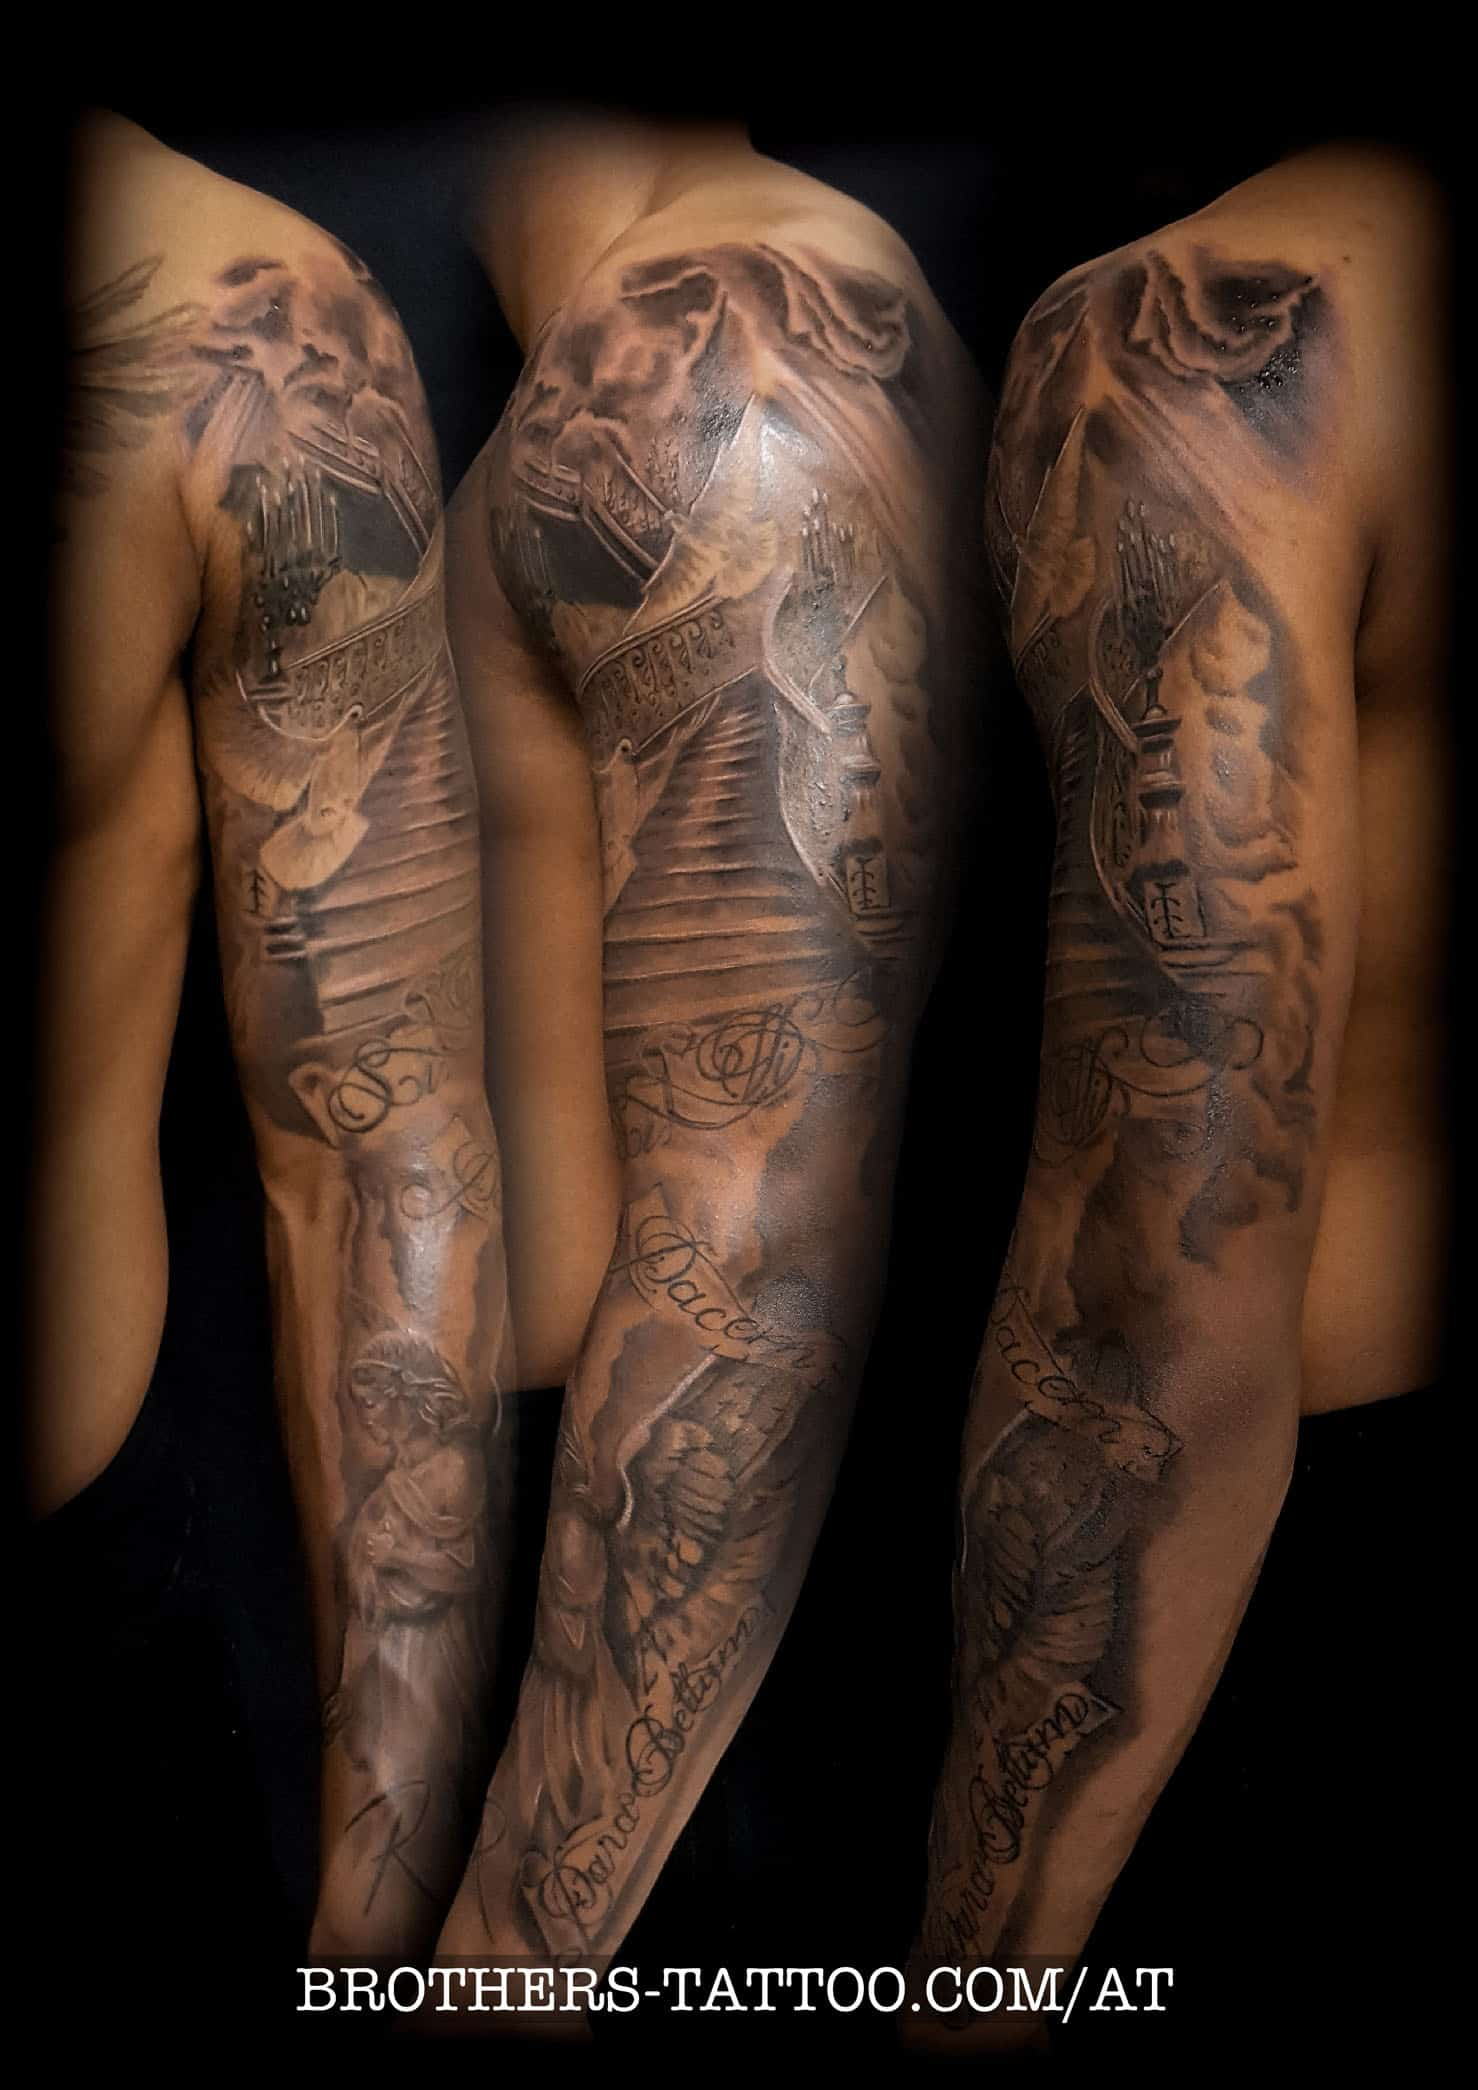 a8bf11dbb Information über unsere Motive • Brothers Tattoo & Piercing